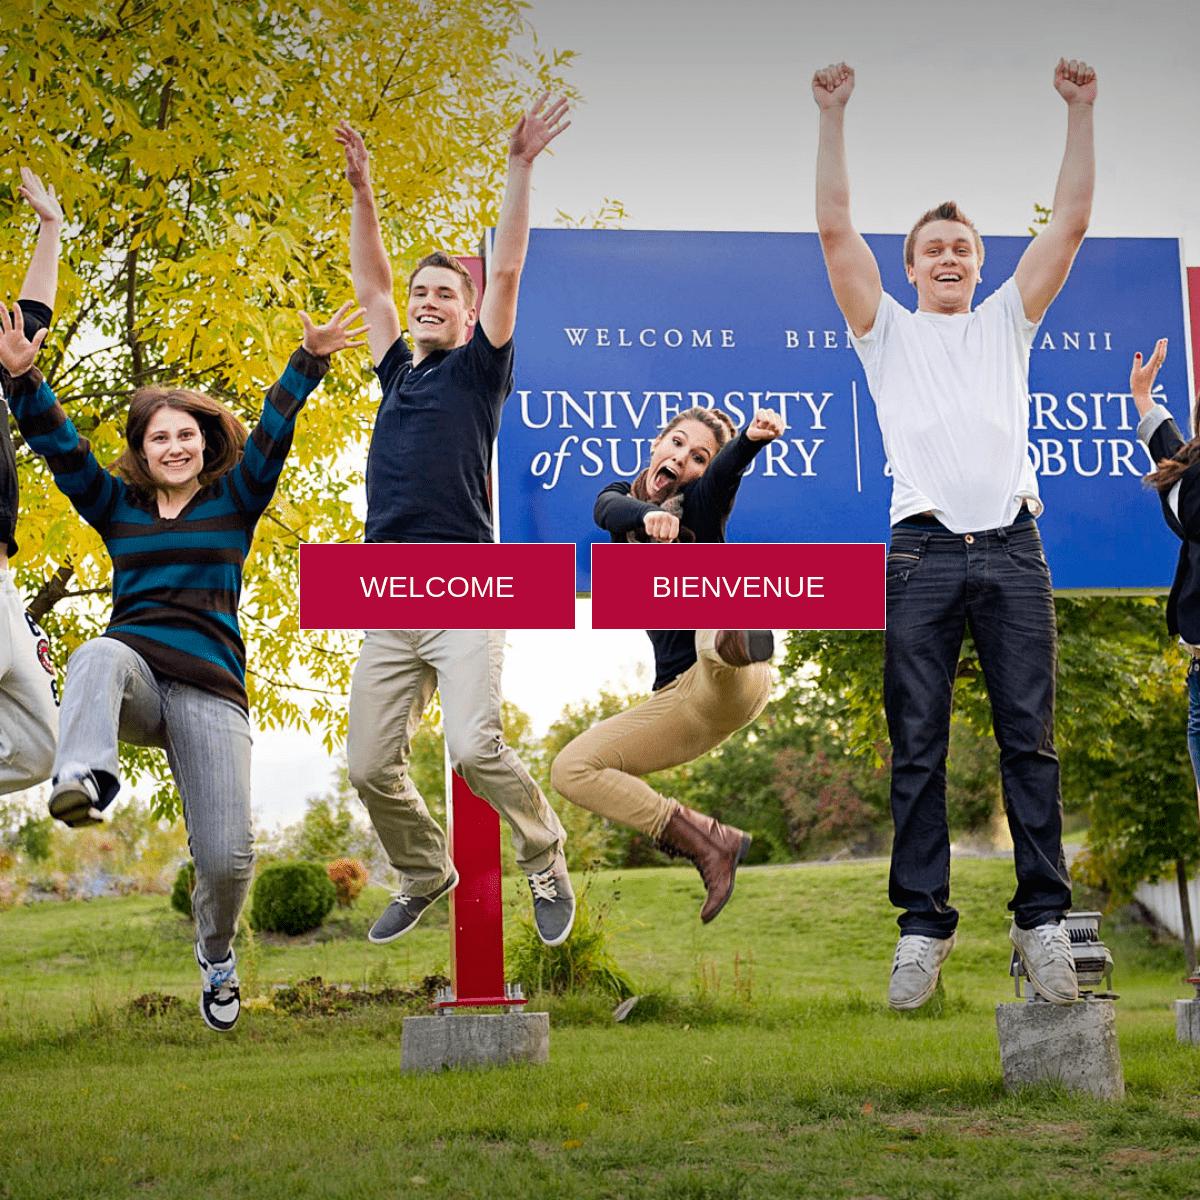 University of Sudbury - Université de Sudbury